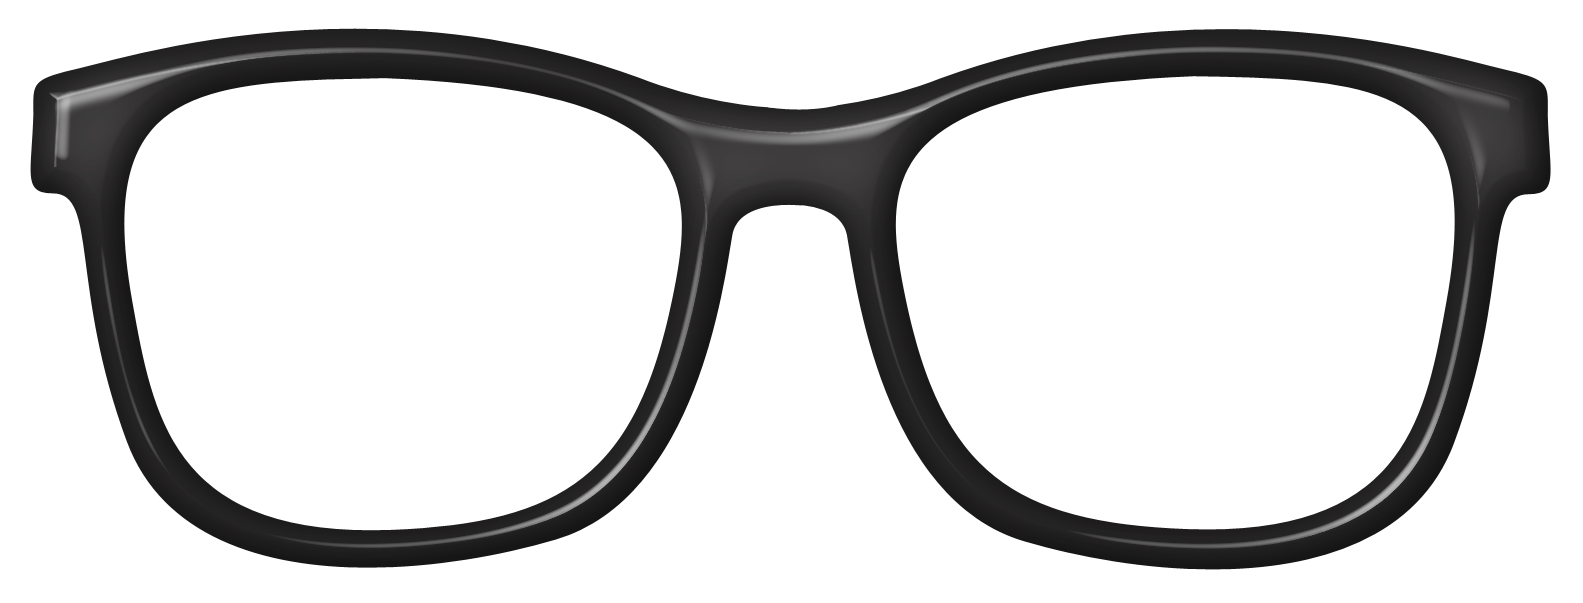 Lentes clipart para photoshop vector freeuse stock Glasses Clipart Image | Medieval | Glasses, Clipart images, Clip art vector freeuse stock